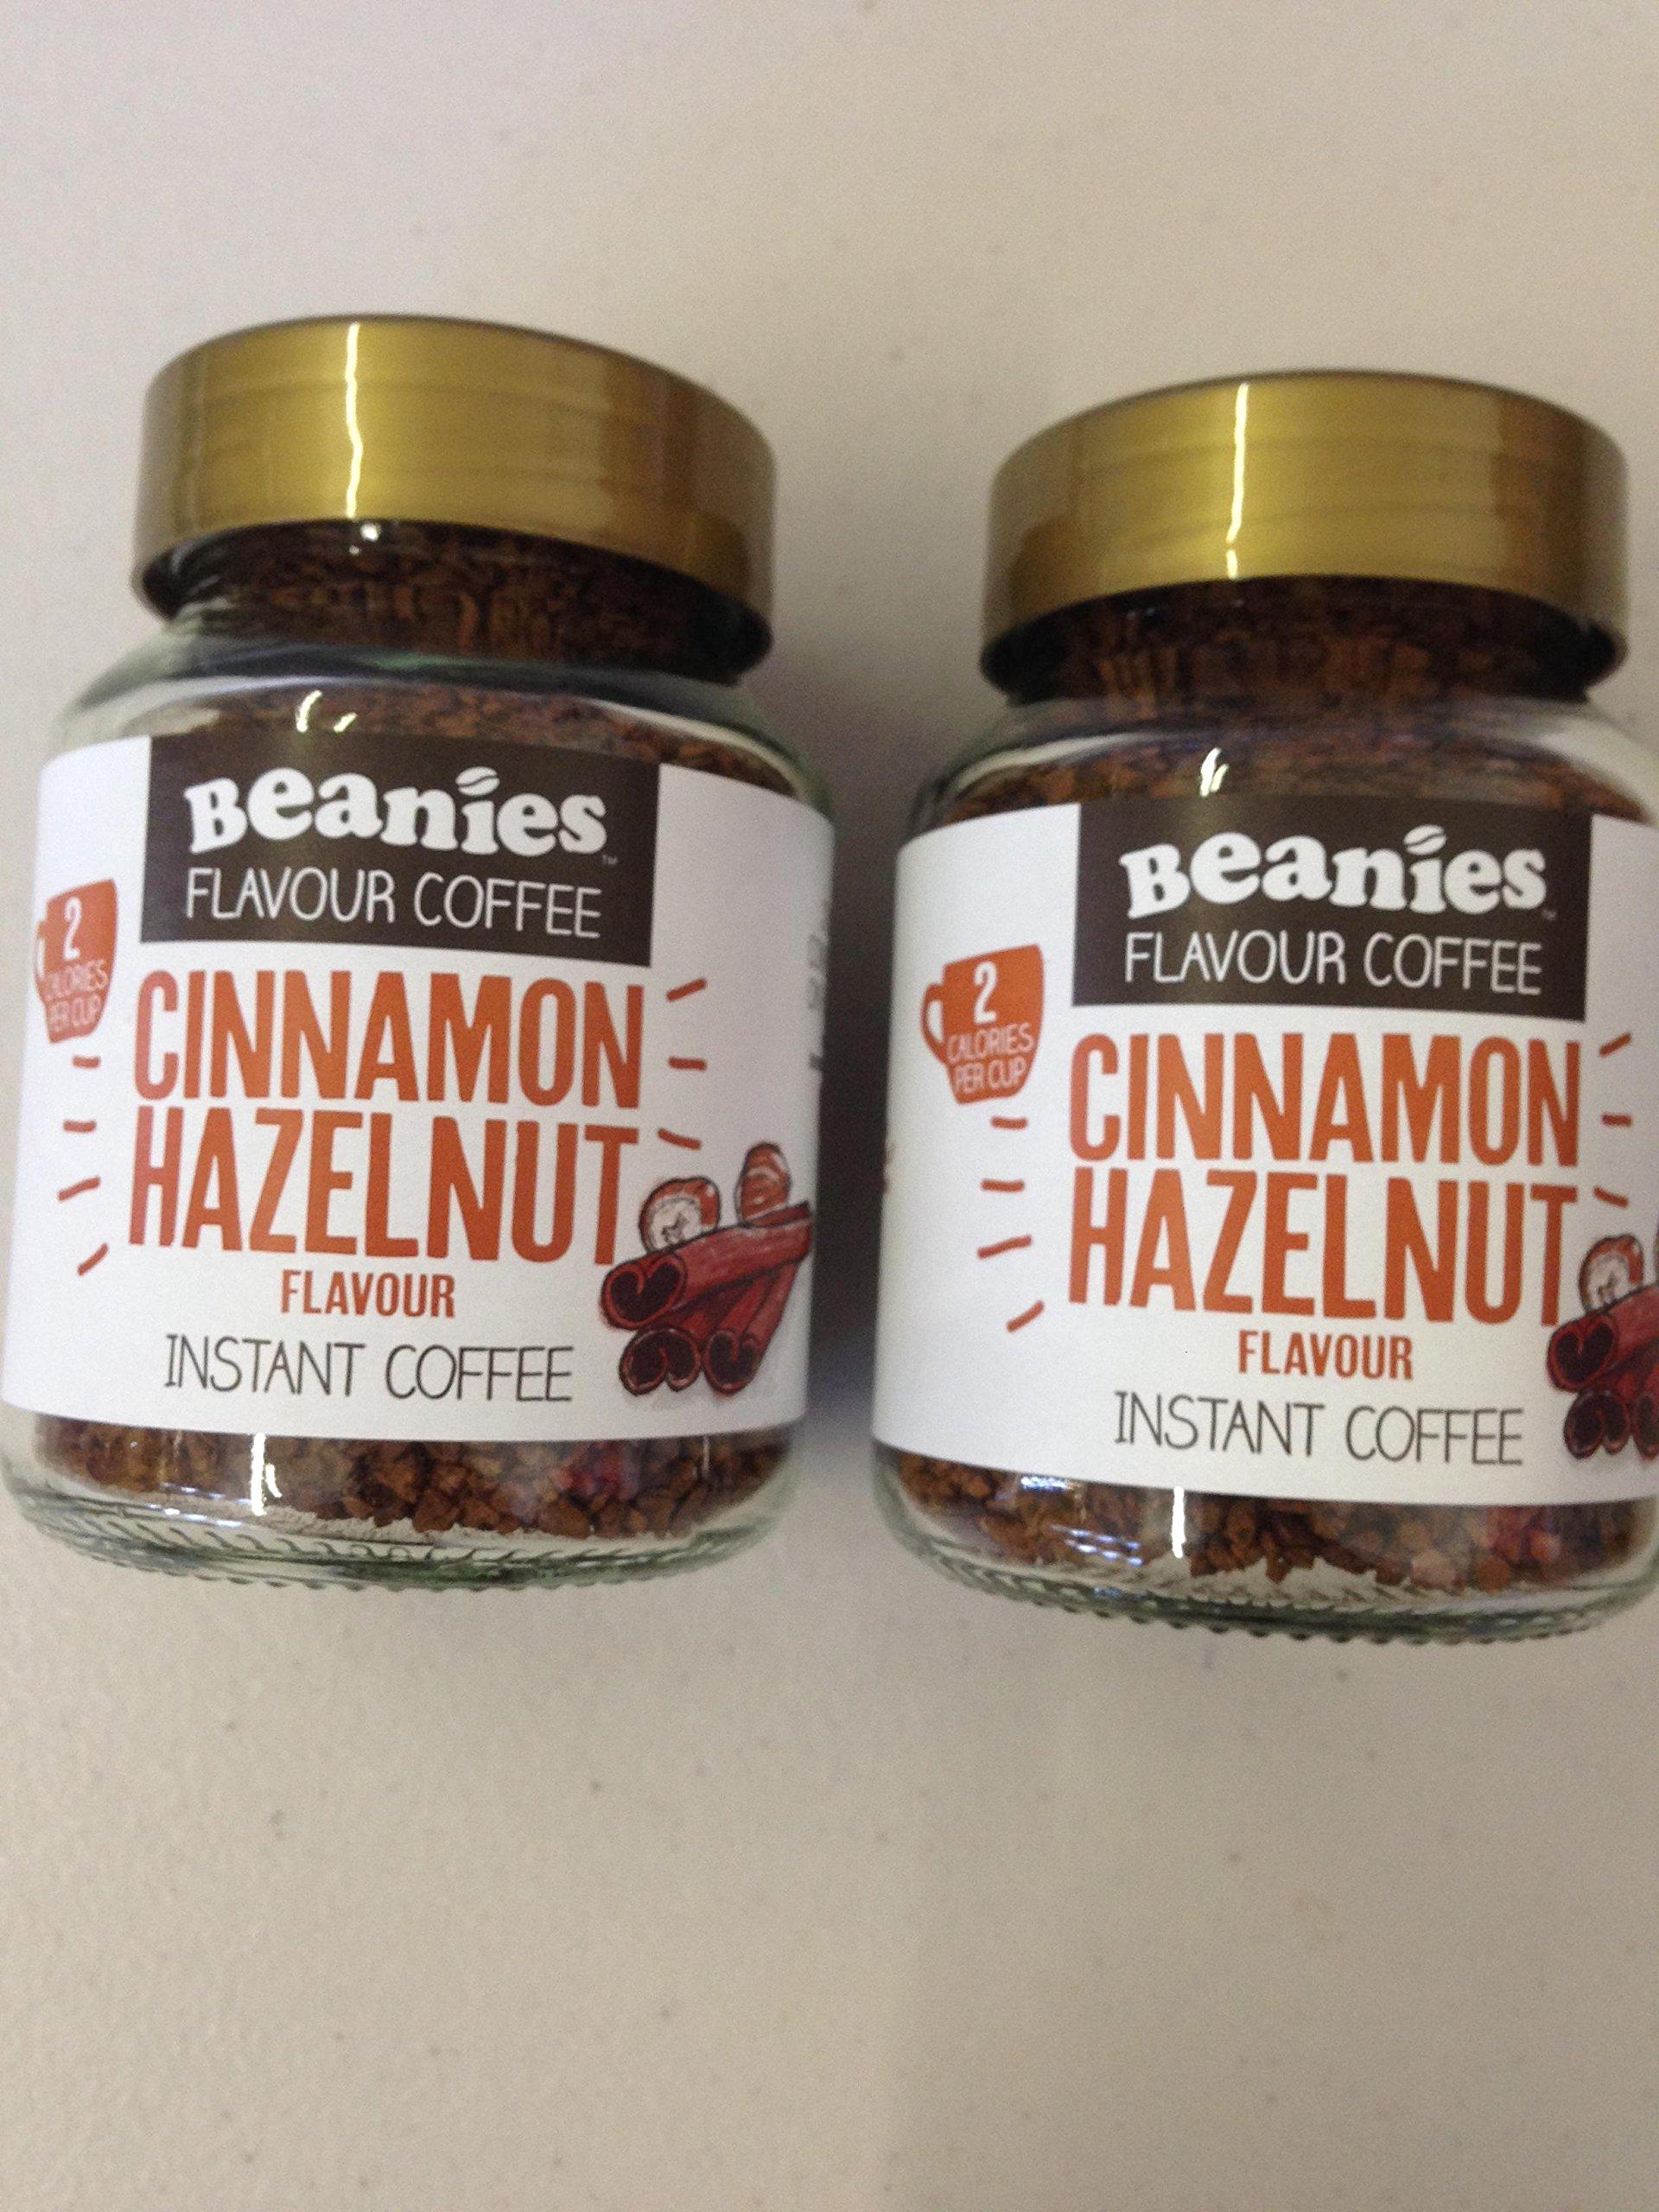 Beanies Cinnamon Hazelnut 2 x 50g Jars